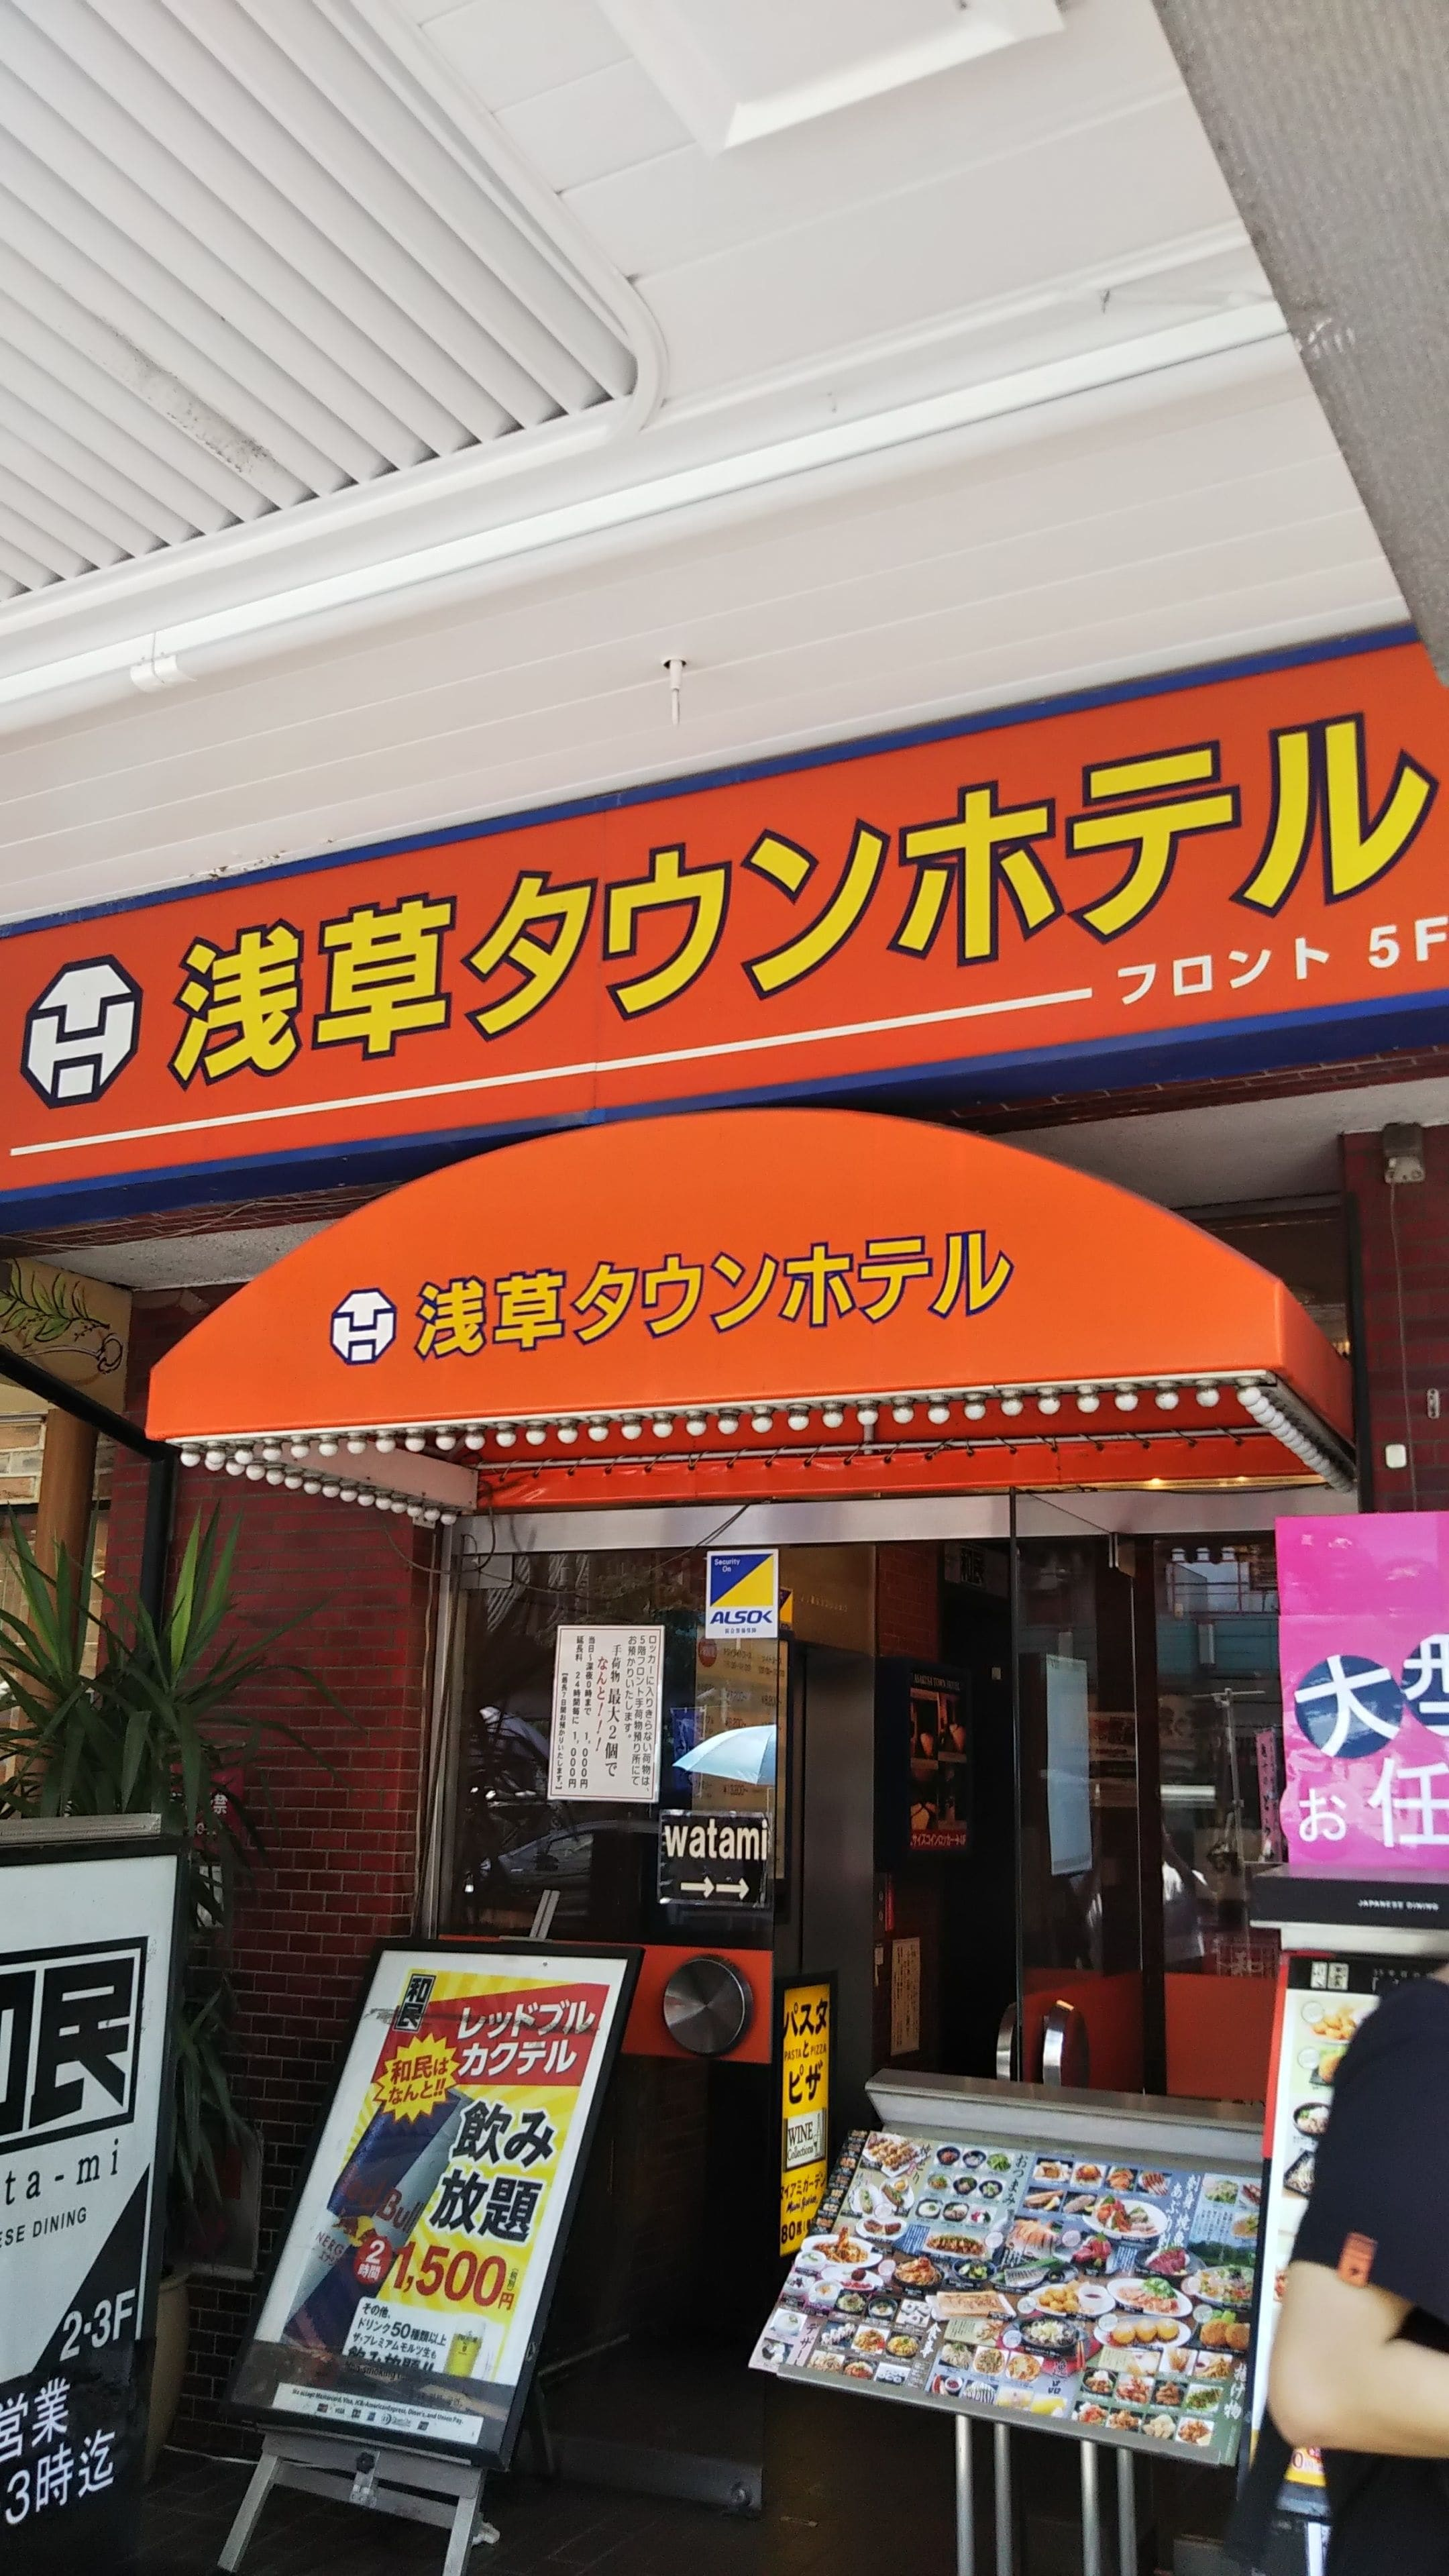 Asakusa Town